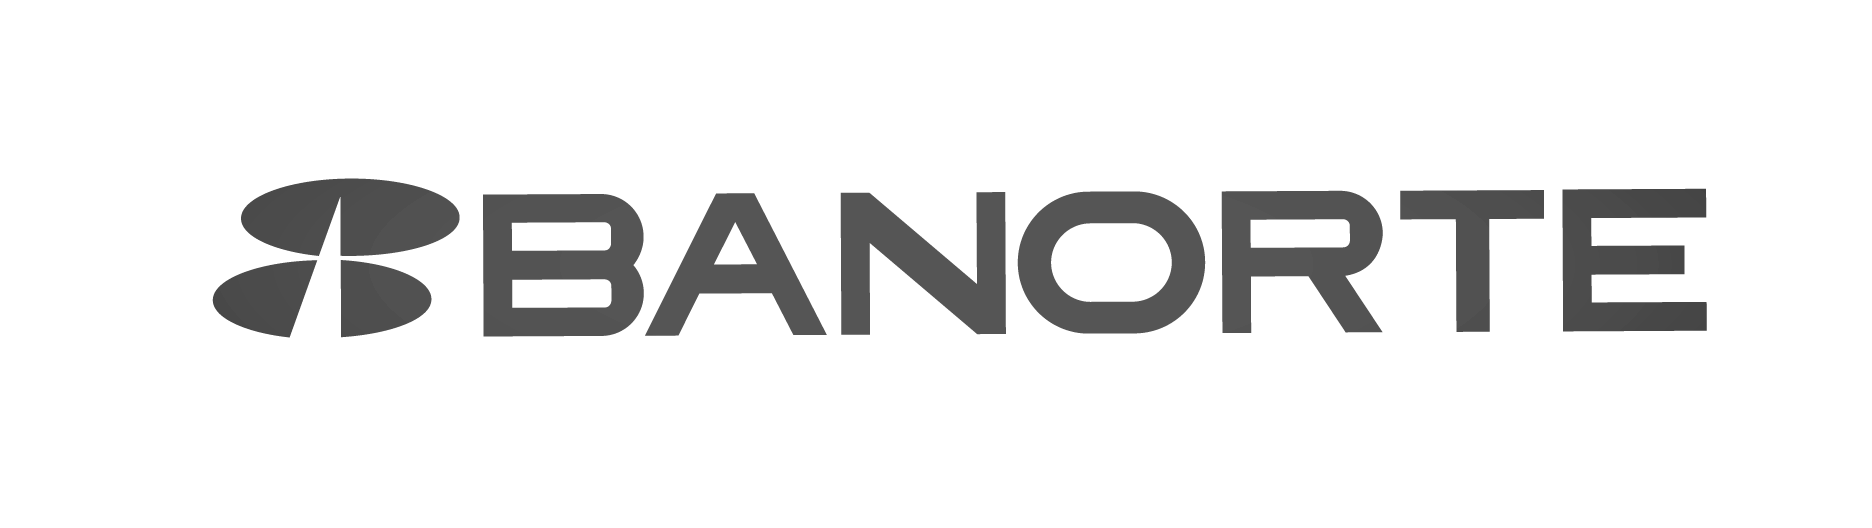 Logo Banorte color_edited.png